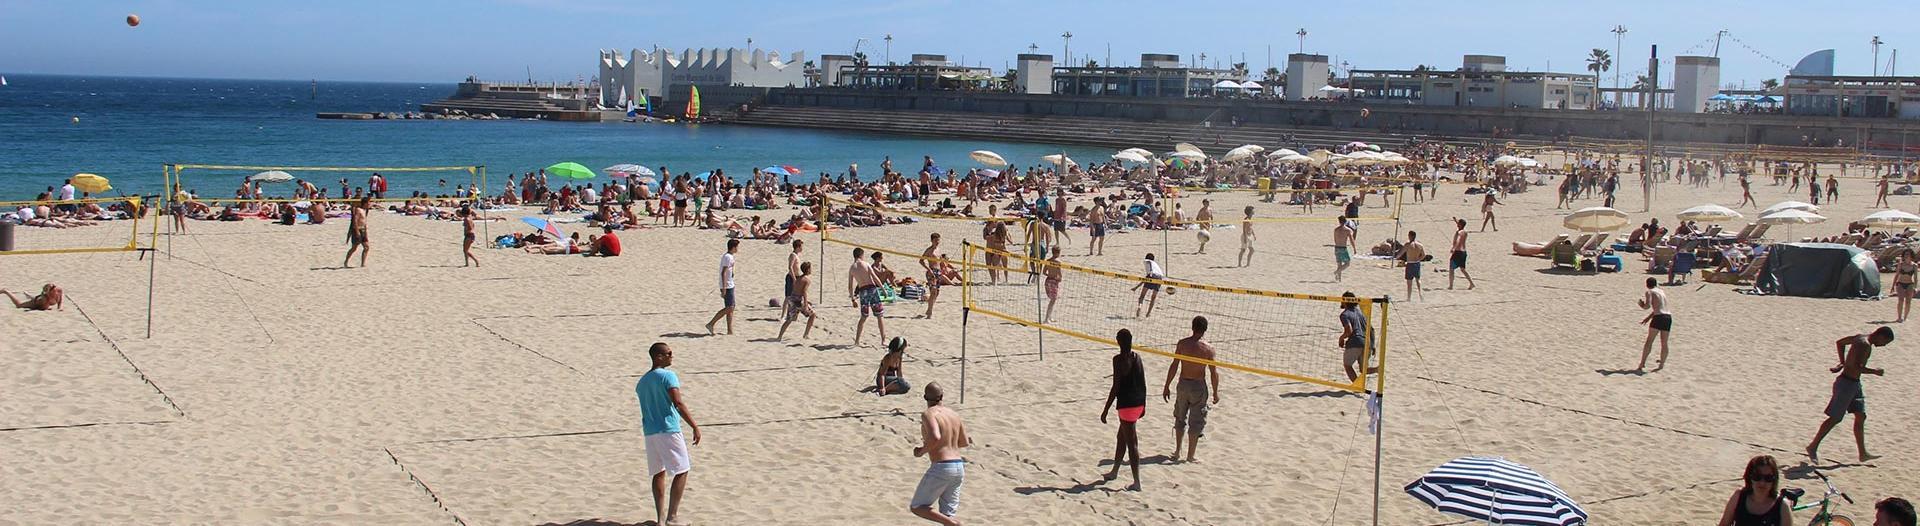 slider-barcelone-plage